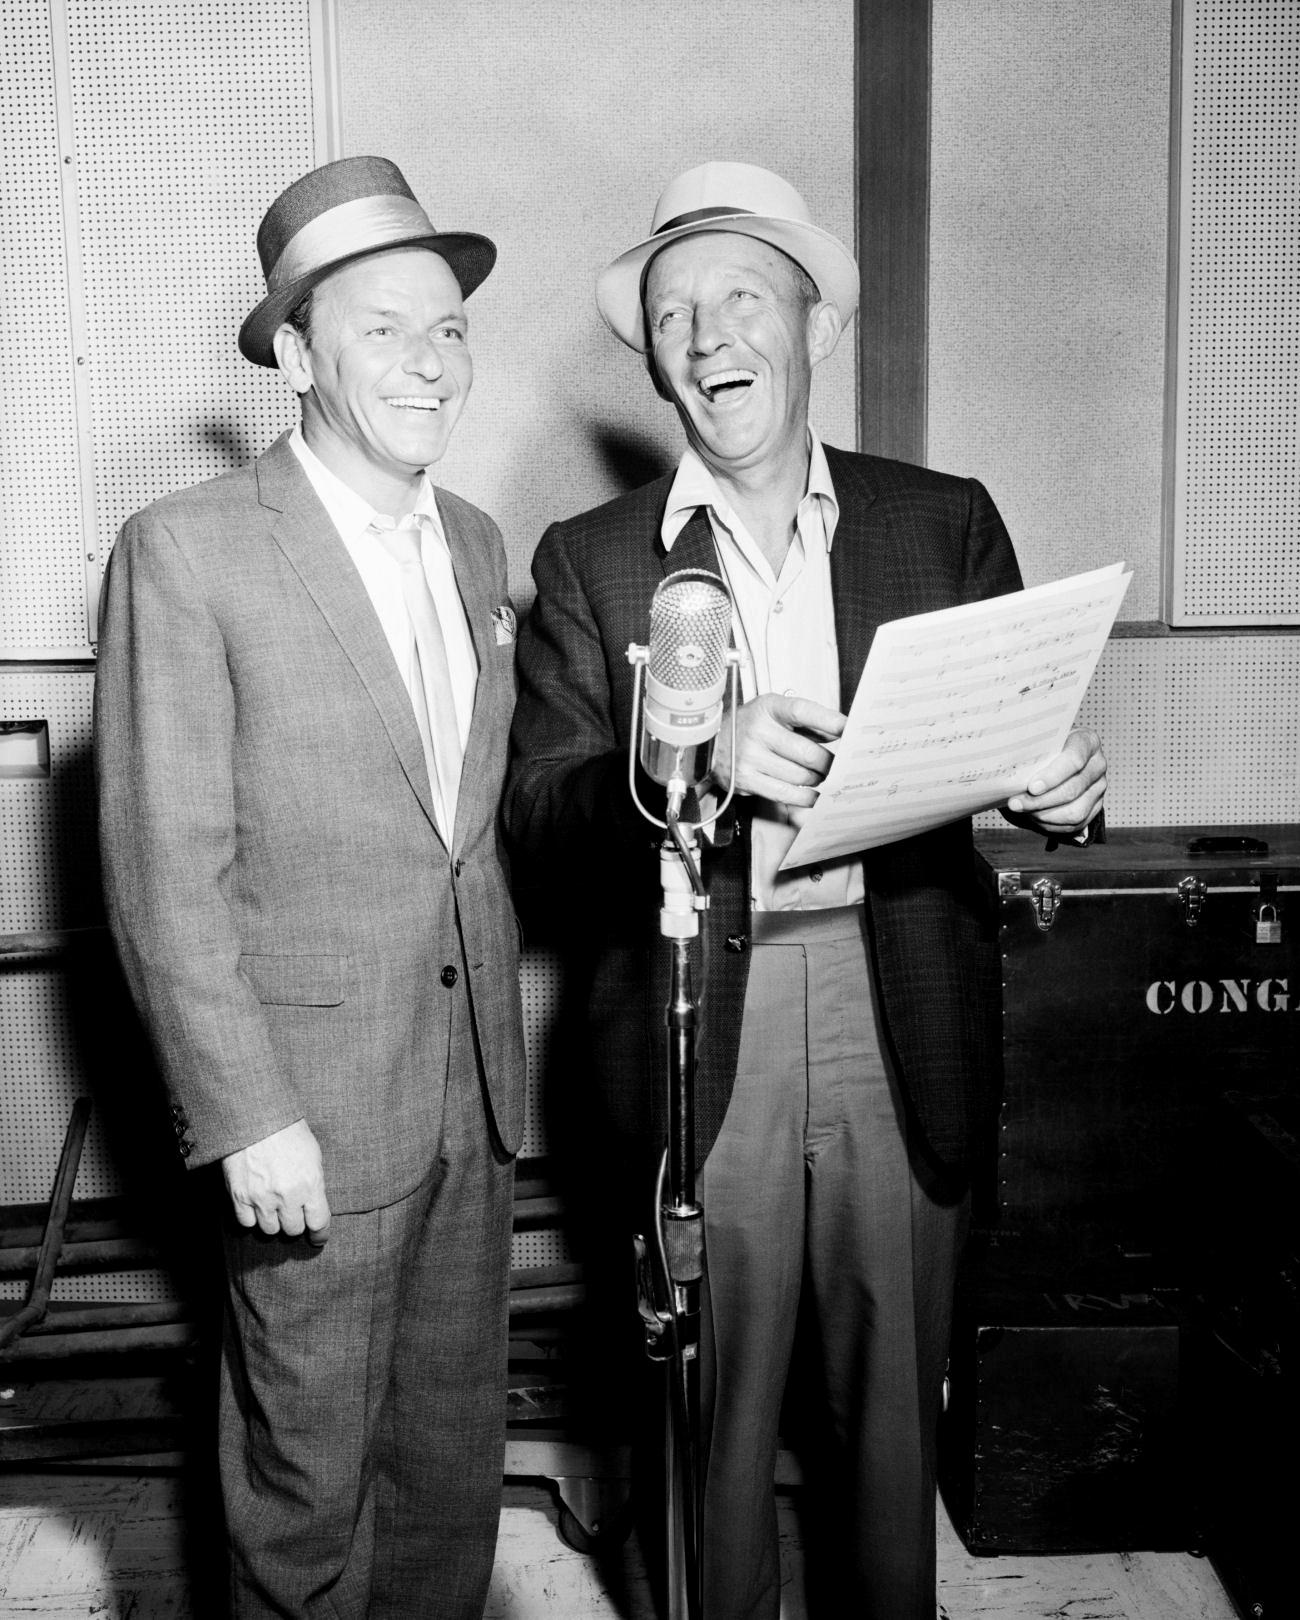 Bing Crosby with Frank Sinatra